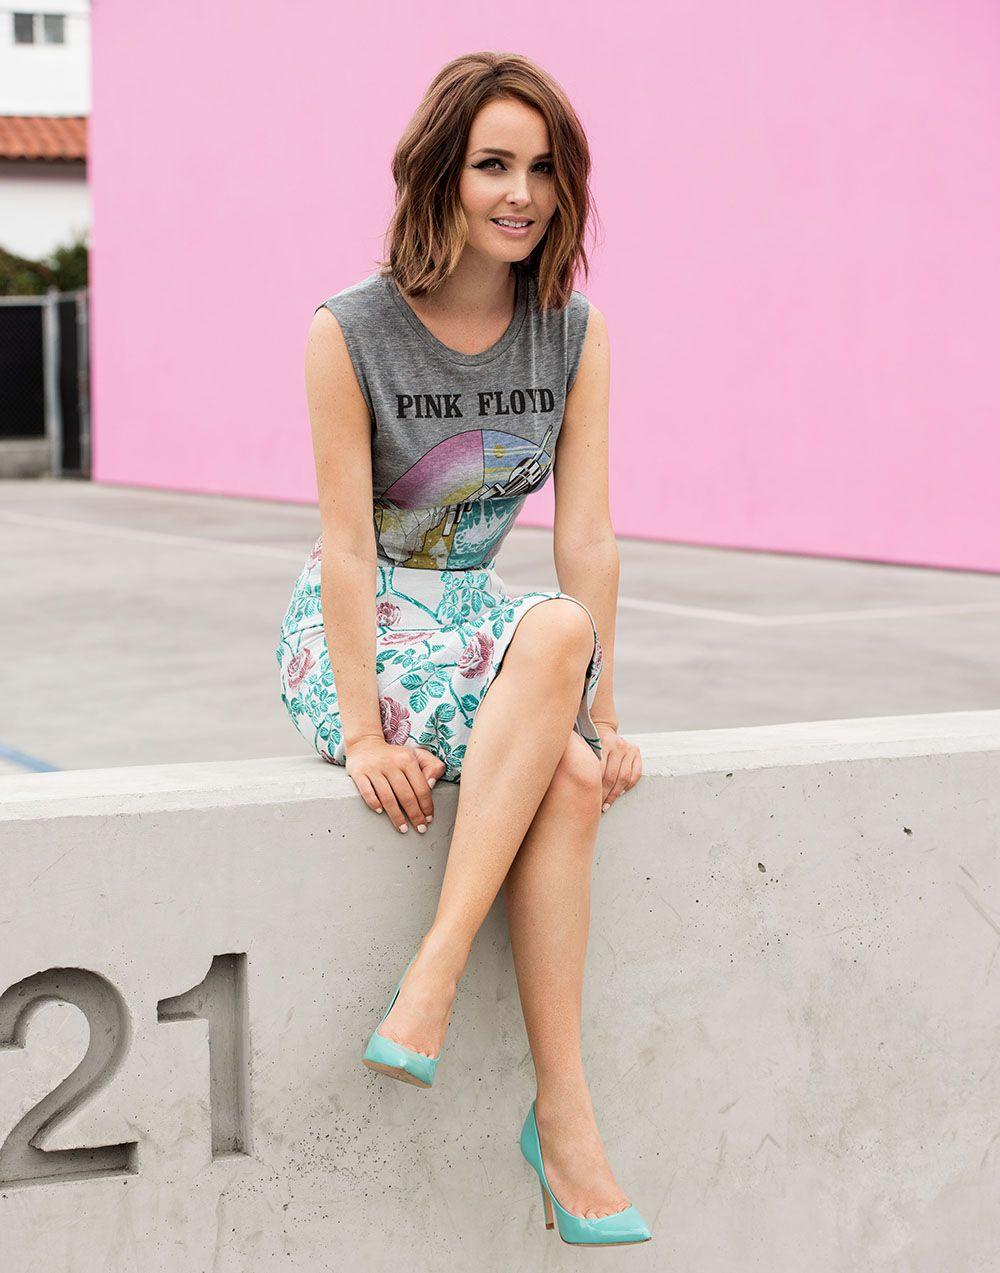 Actress to Know: 'Grey's Anatomy' Star Camilla Luddington